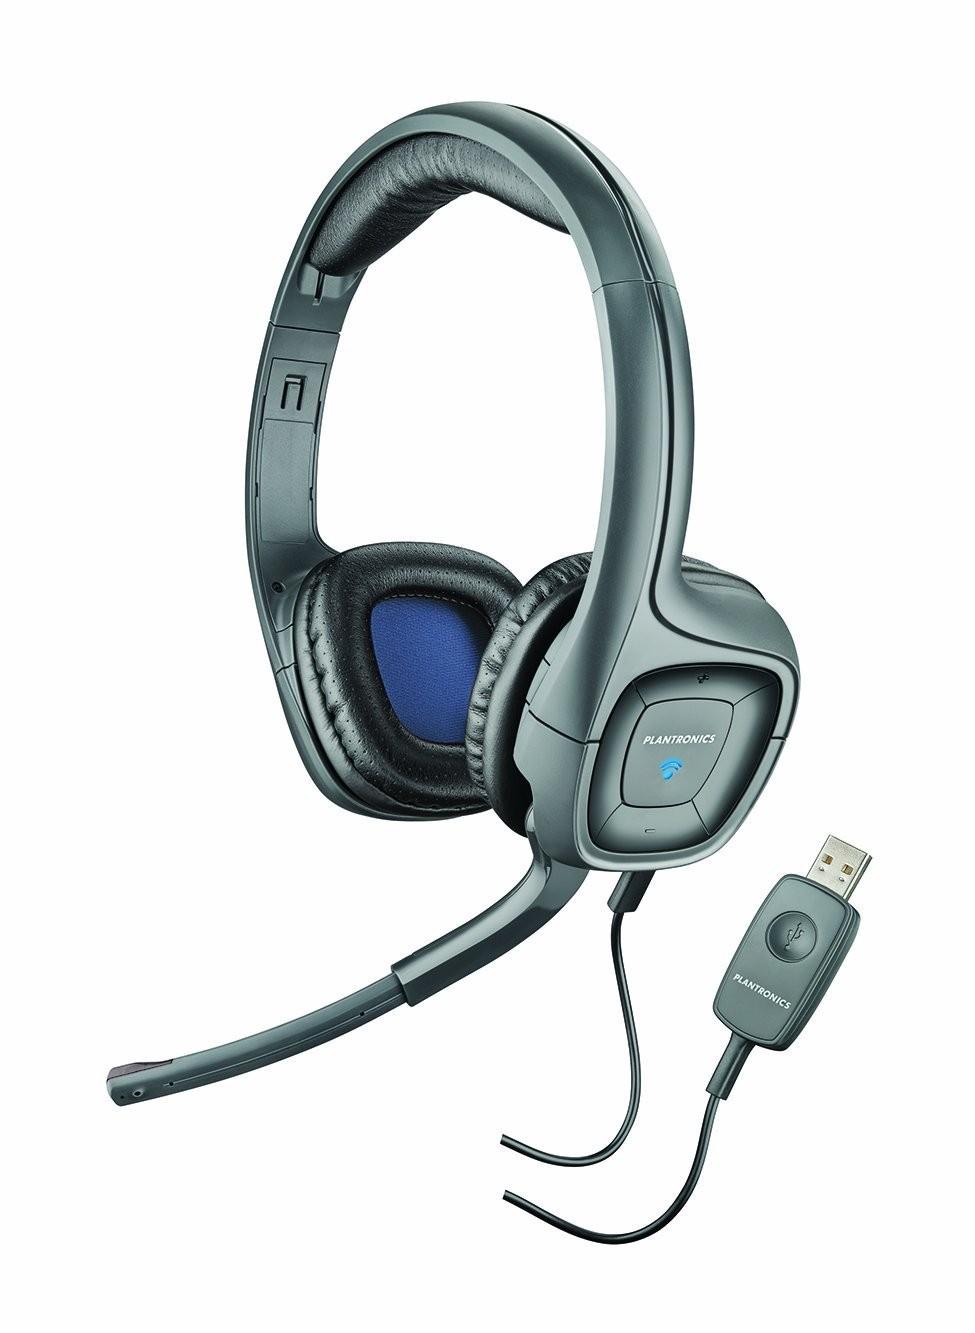 Plantronics Audio 655 USB Computer Headset